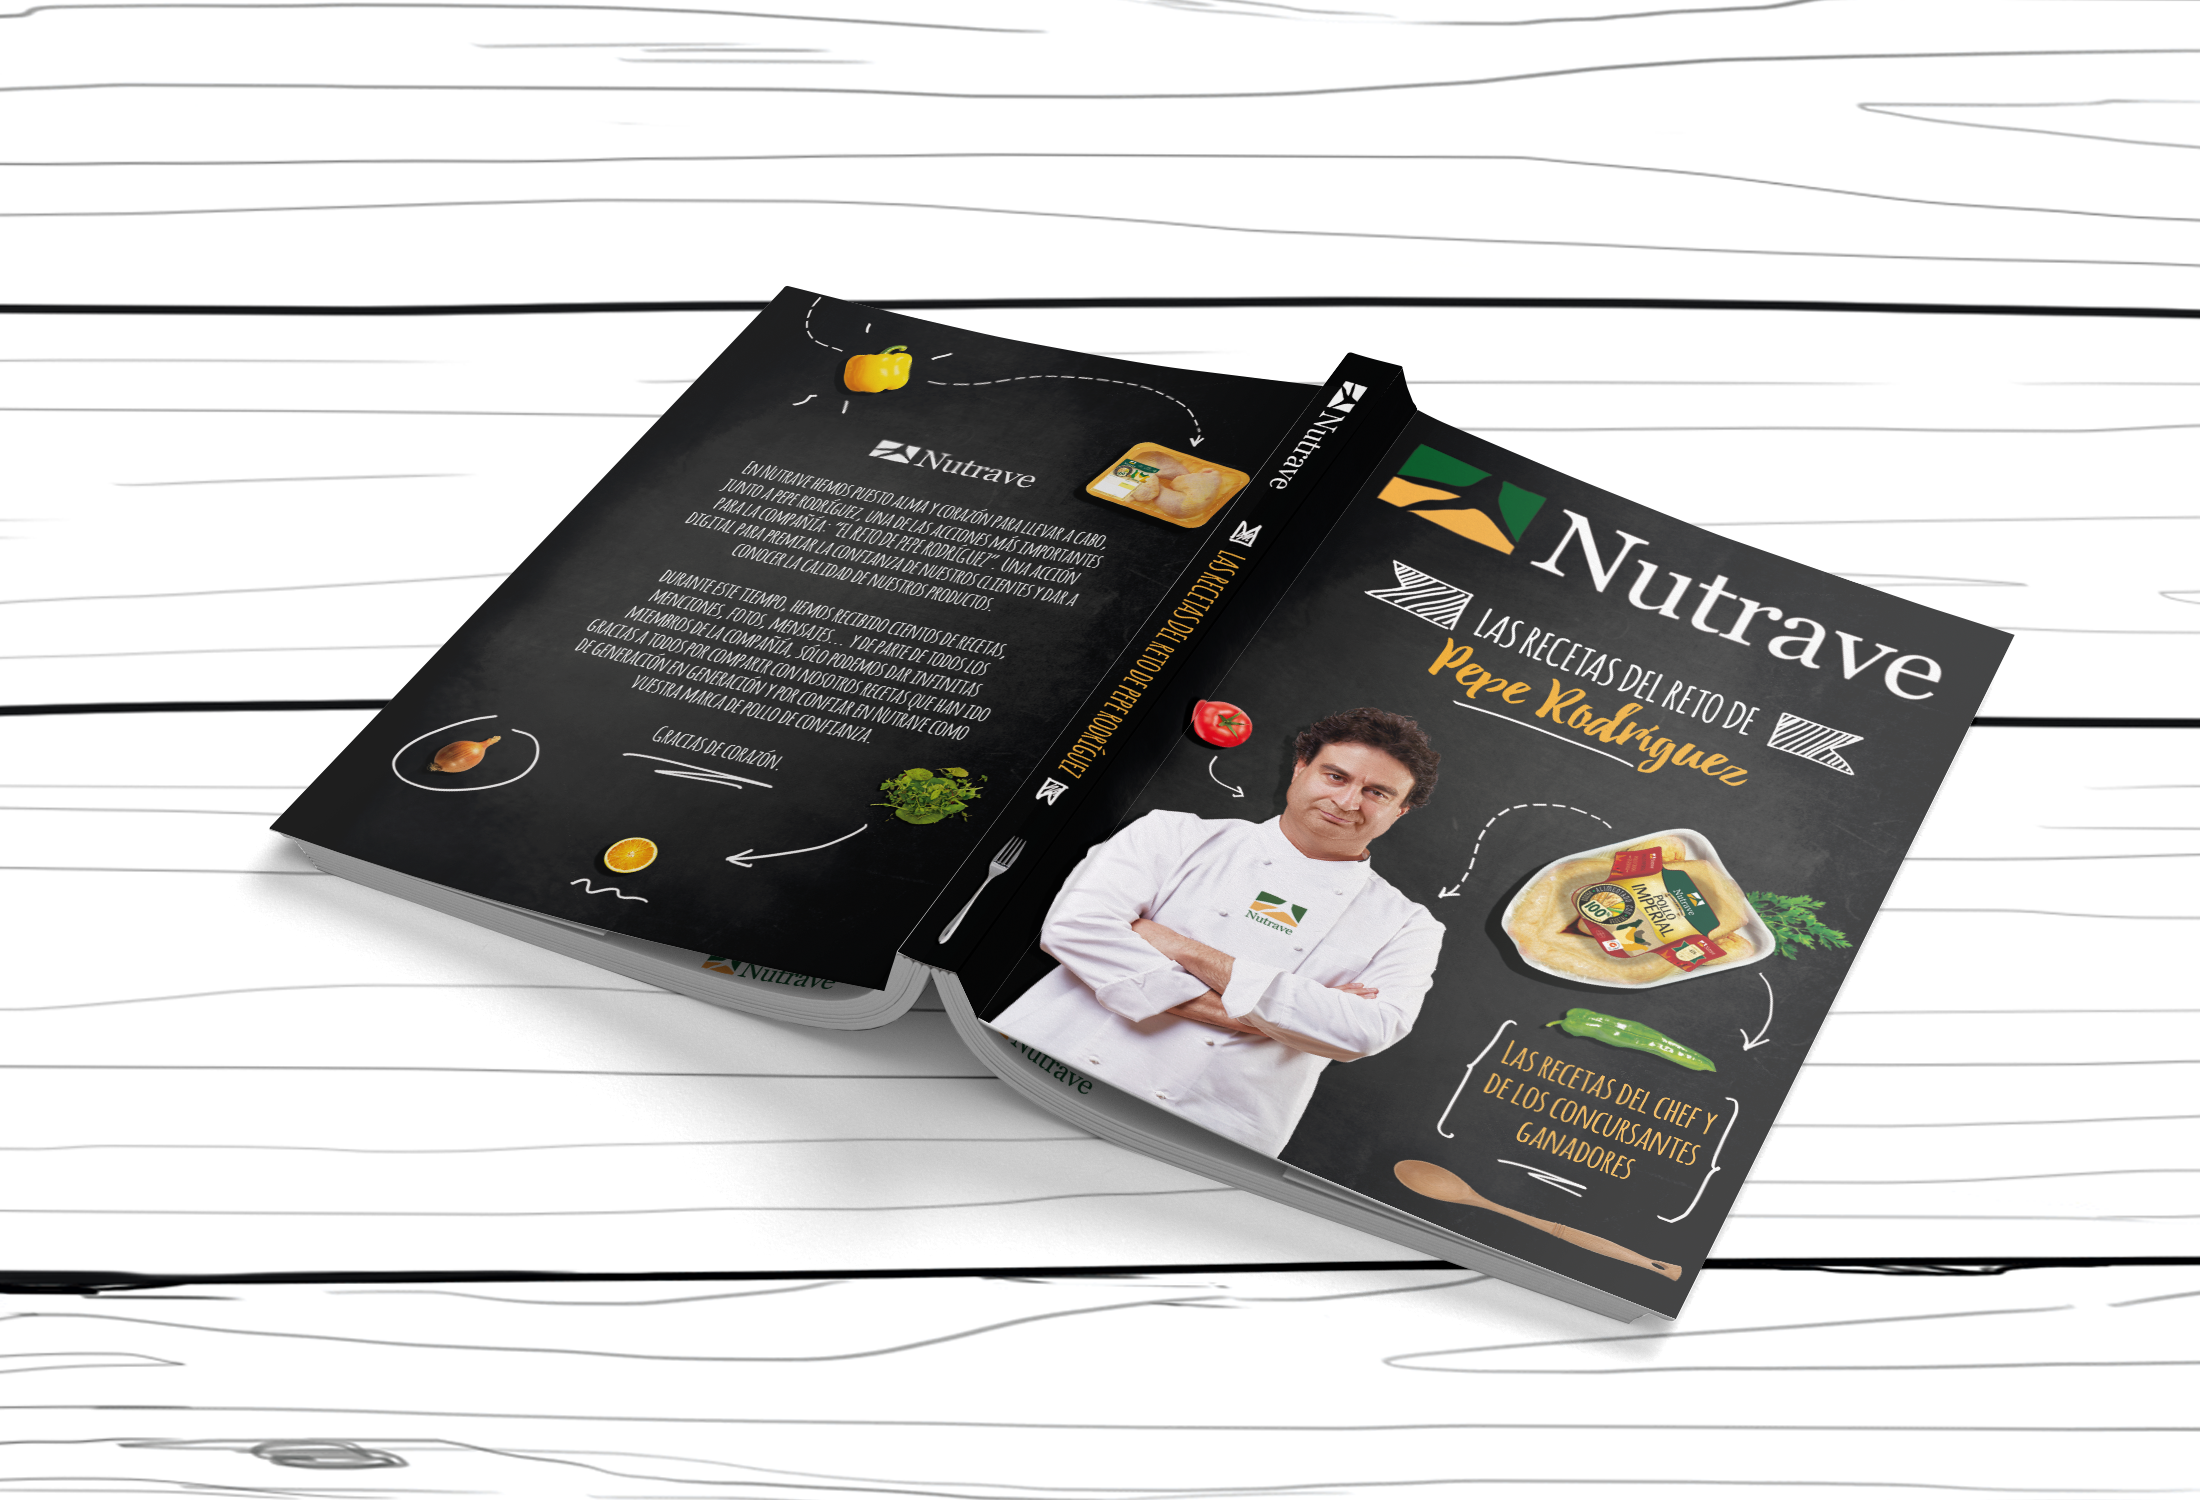 Exterior libro de recetas Nutrave con Pepe Rodríguez